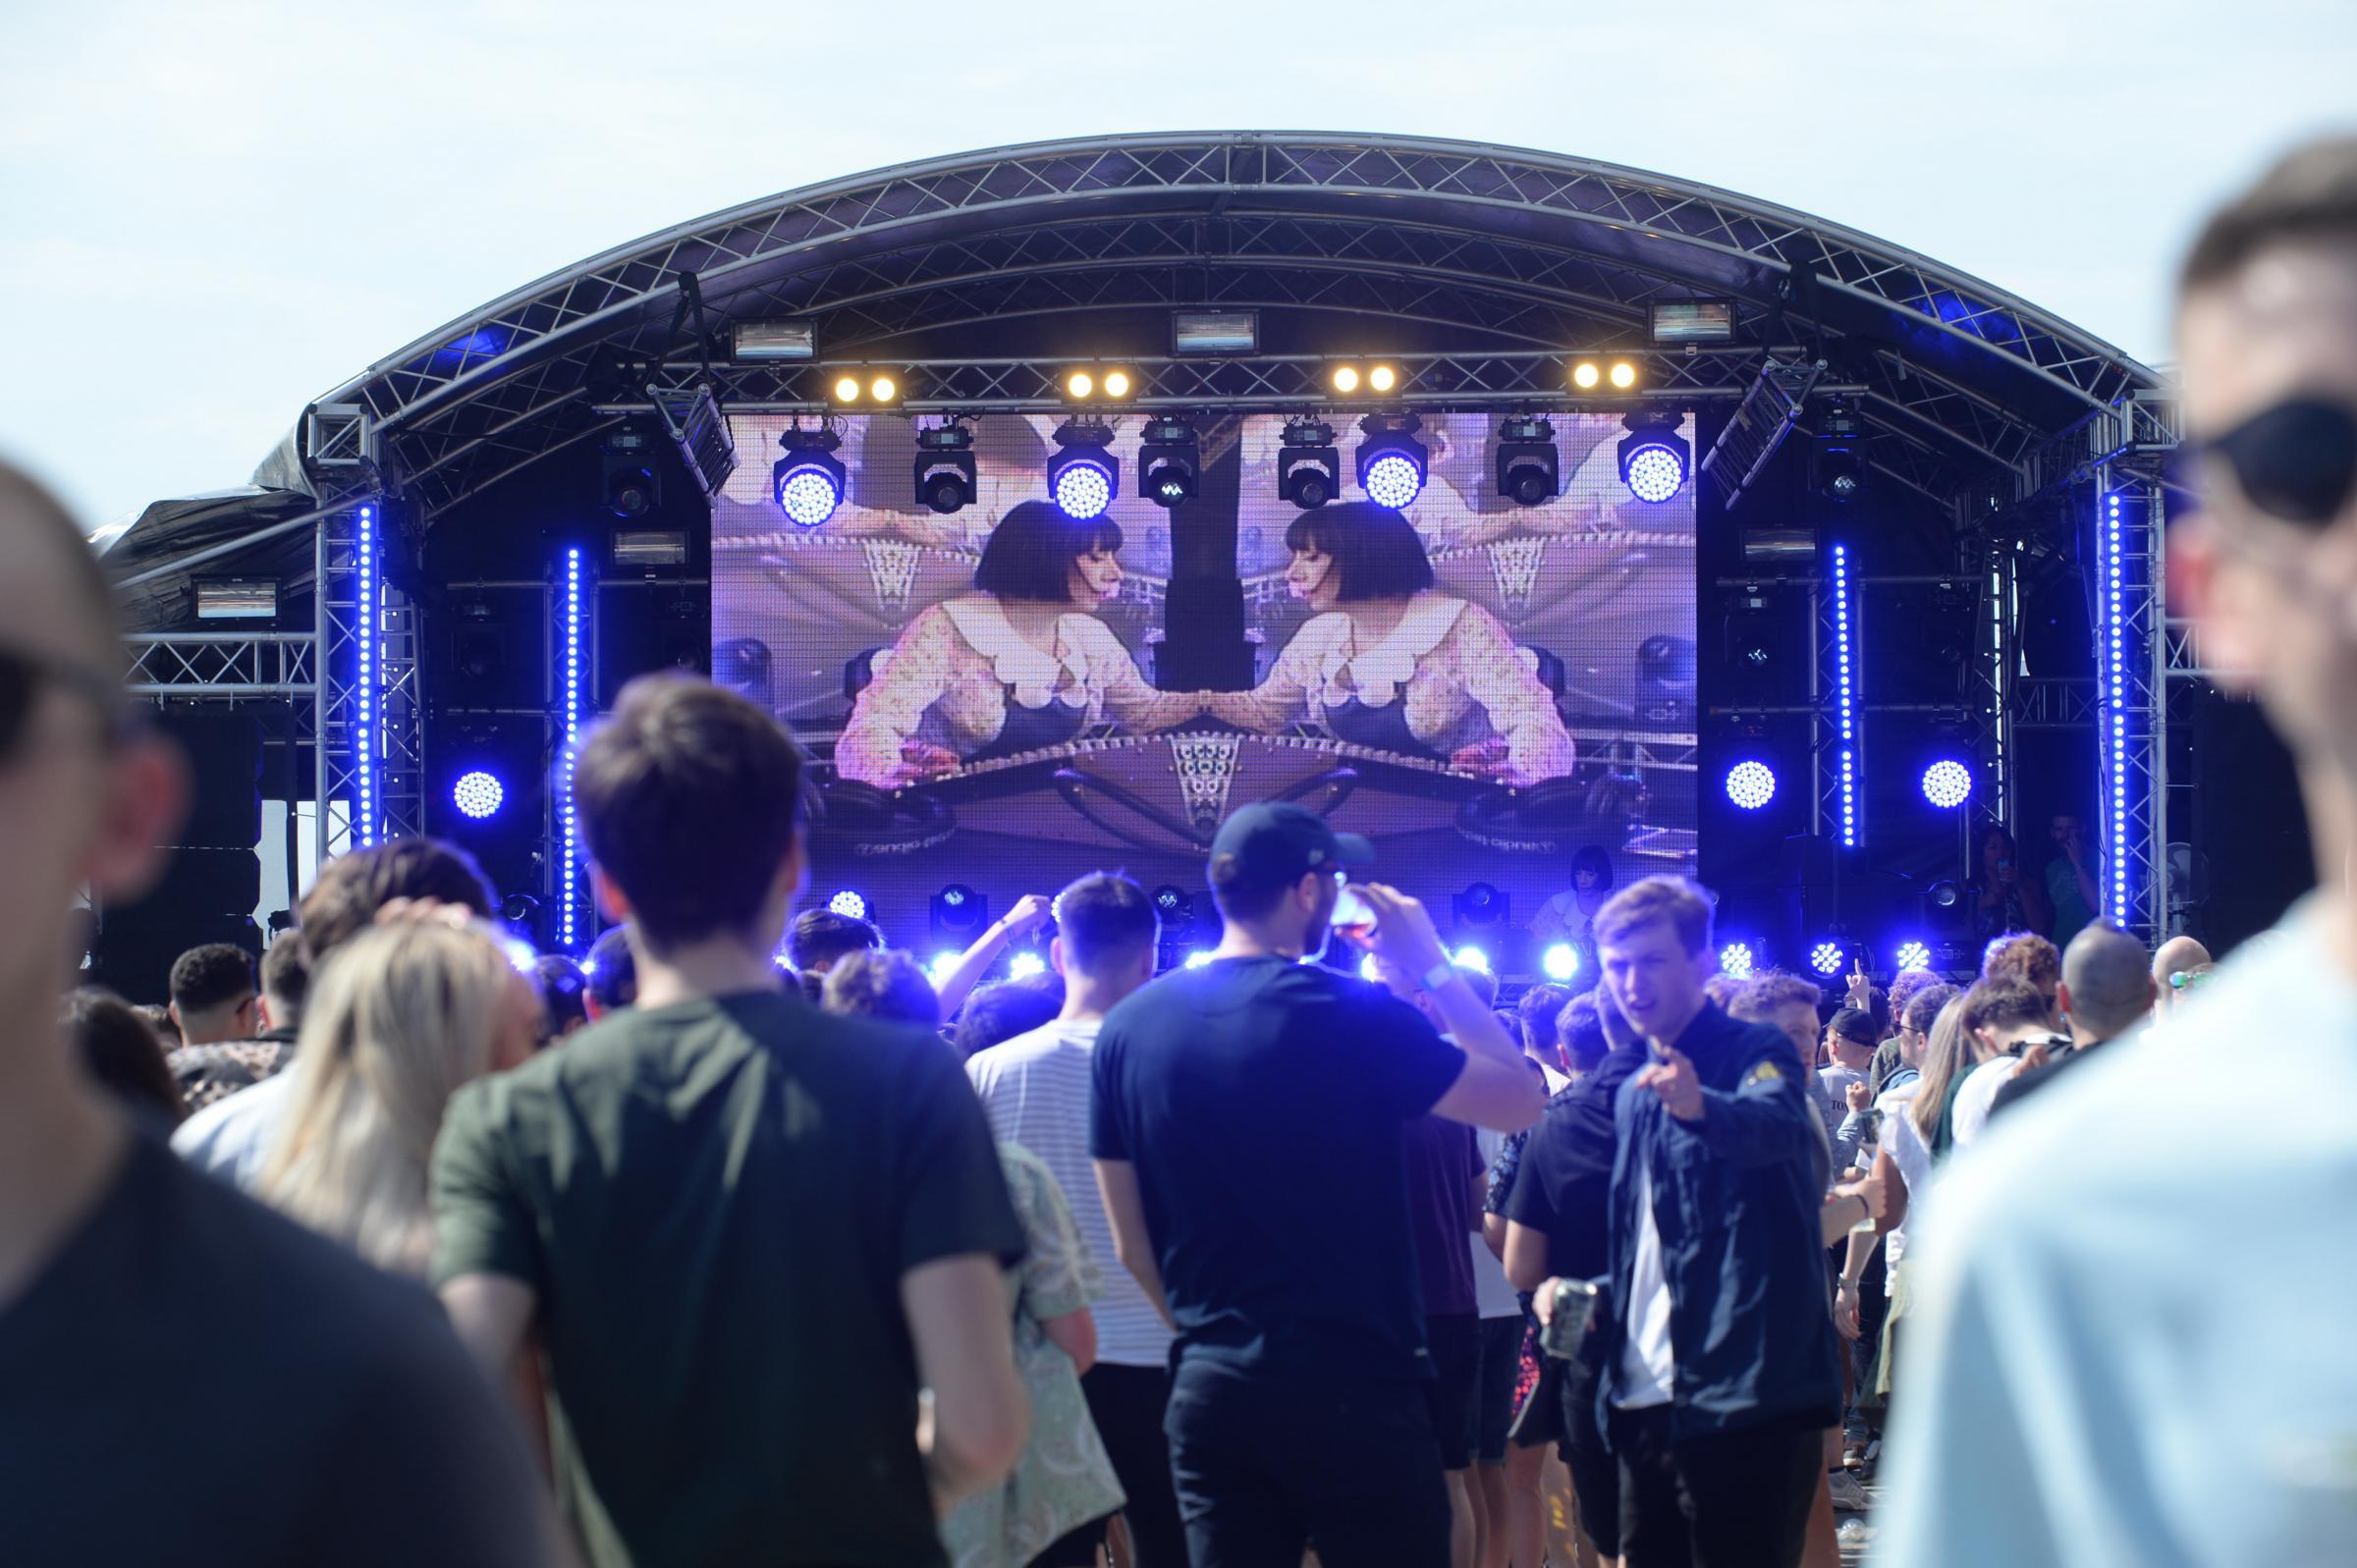 Disclosure to headline Glasgow's Riverside Festival 2020